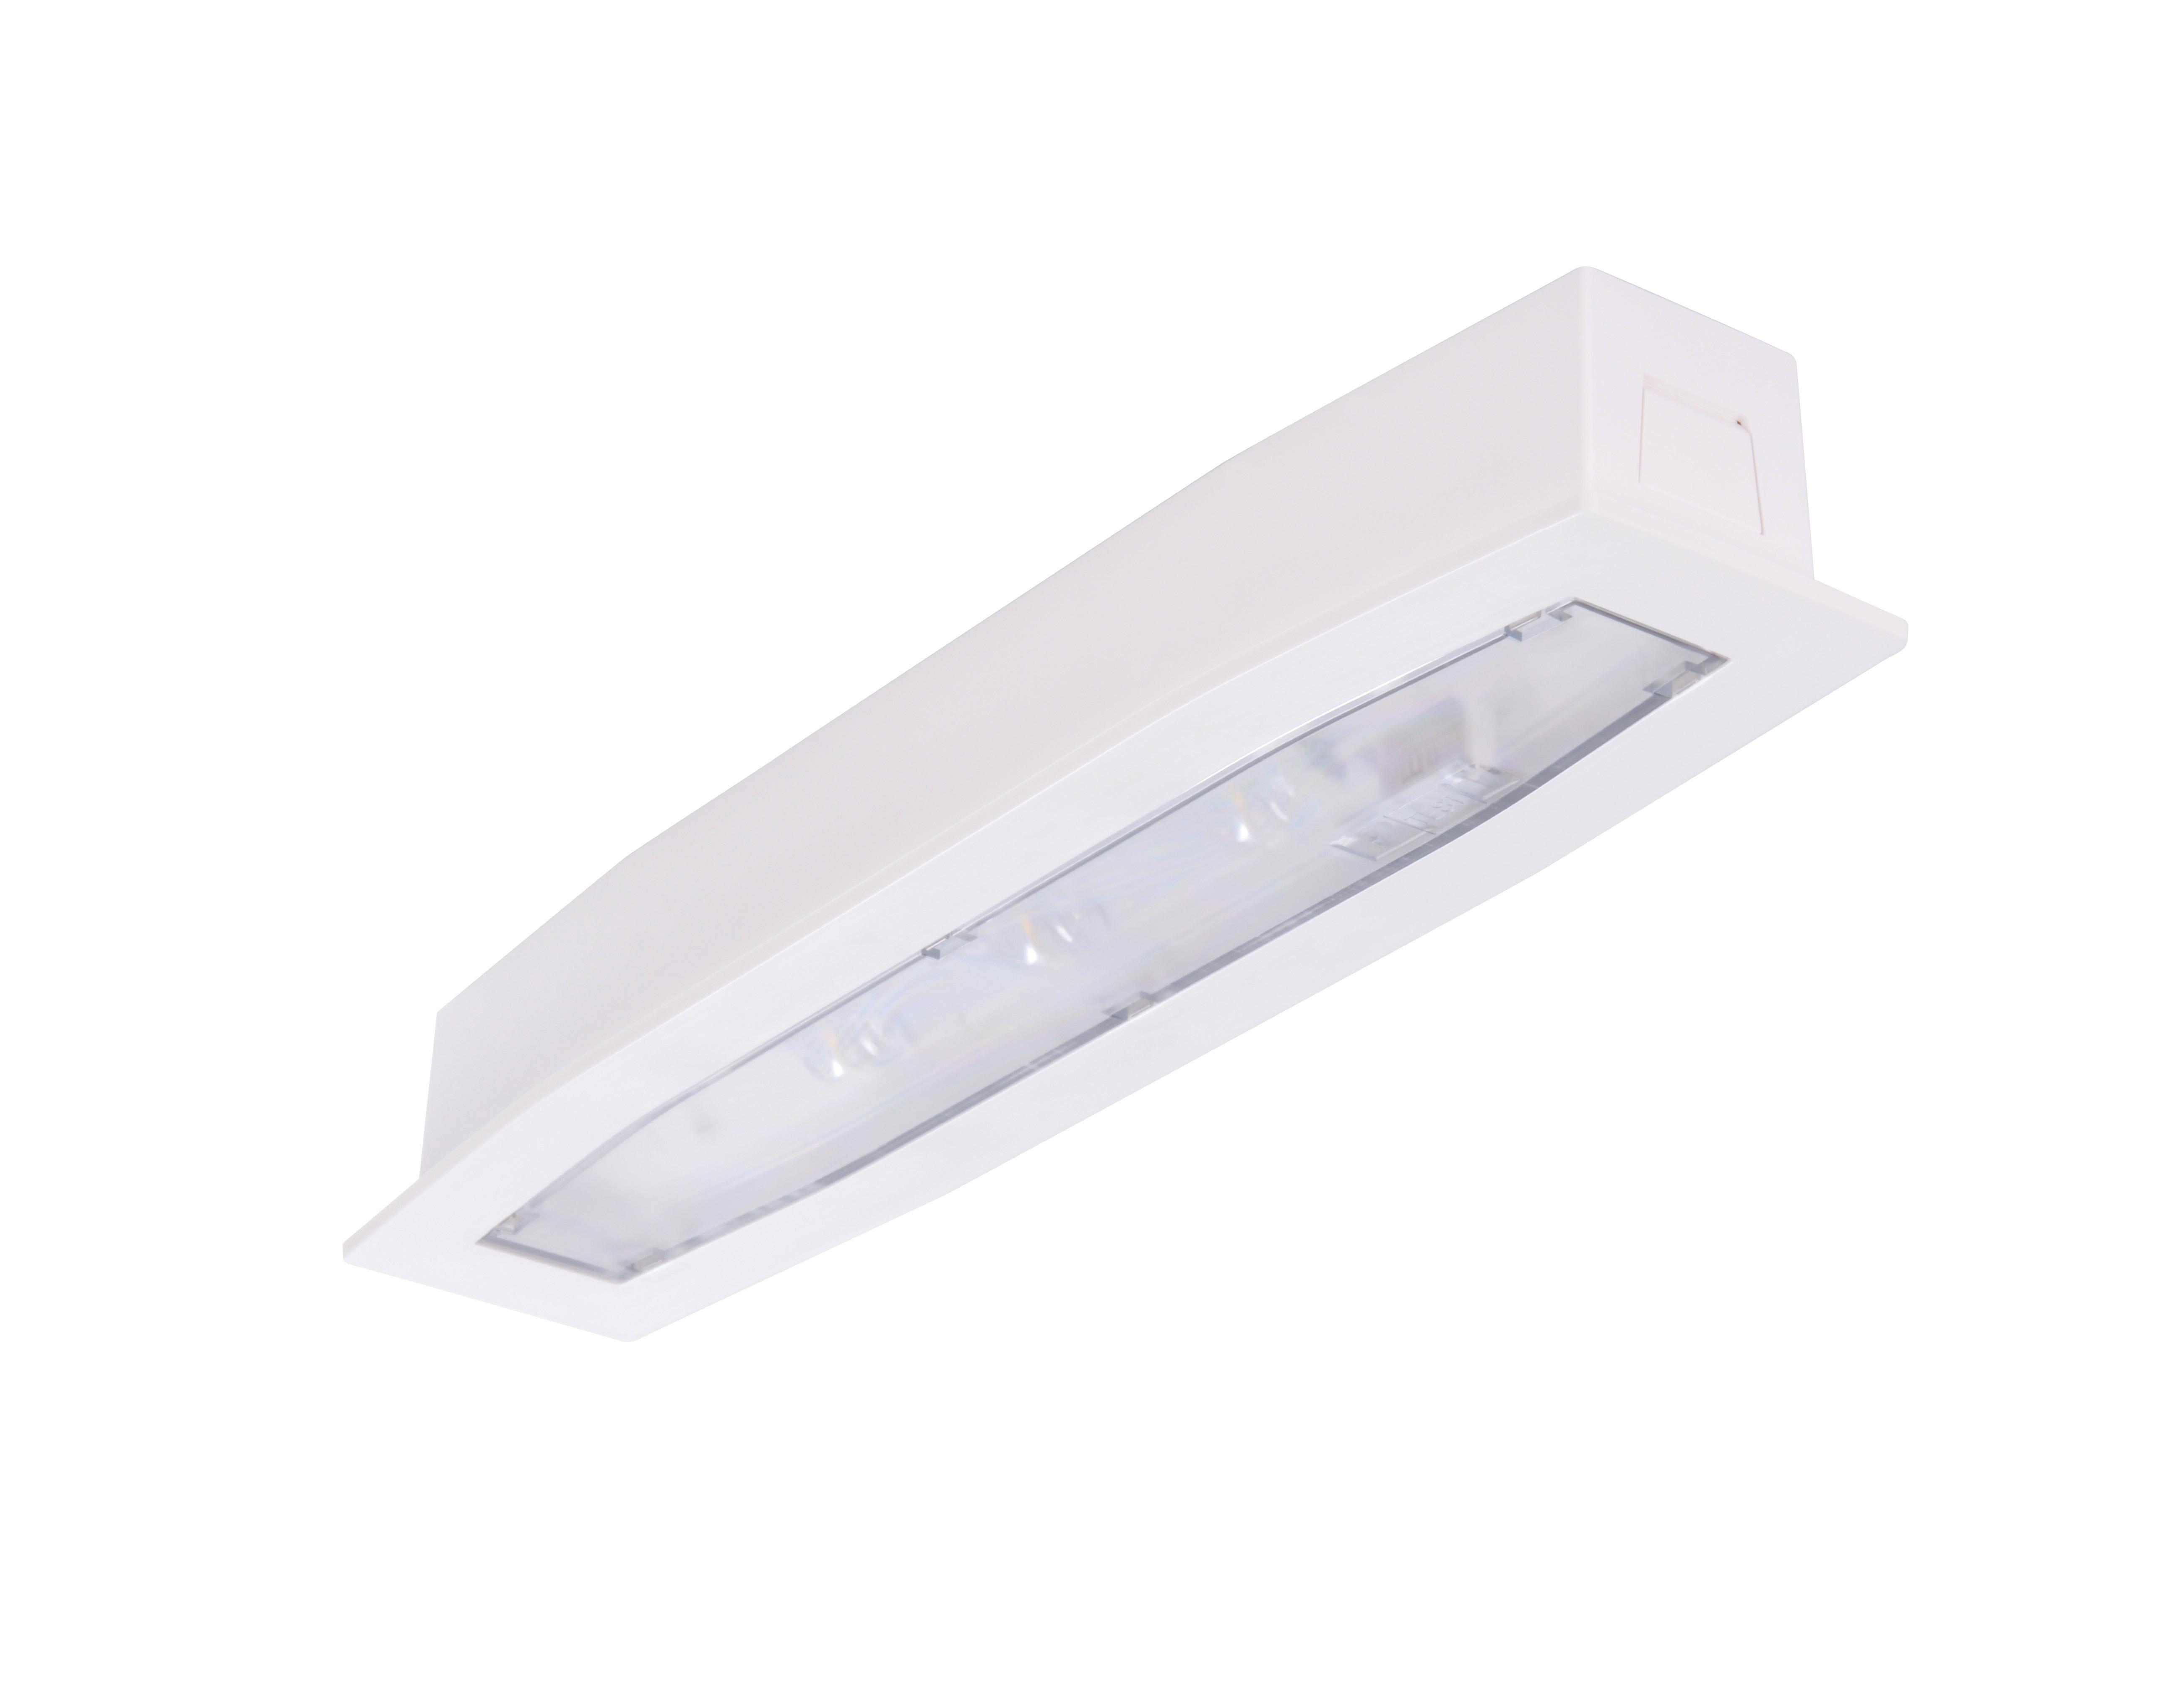 Lampa emergenta led Intelight 94769   3h nementinut test automat 3